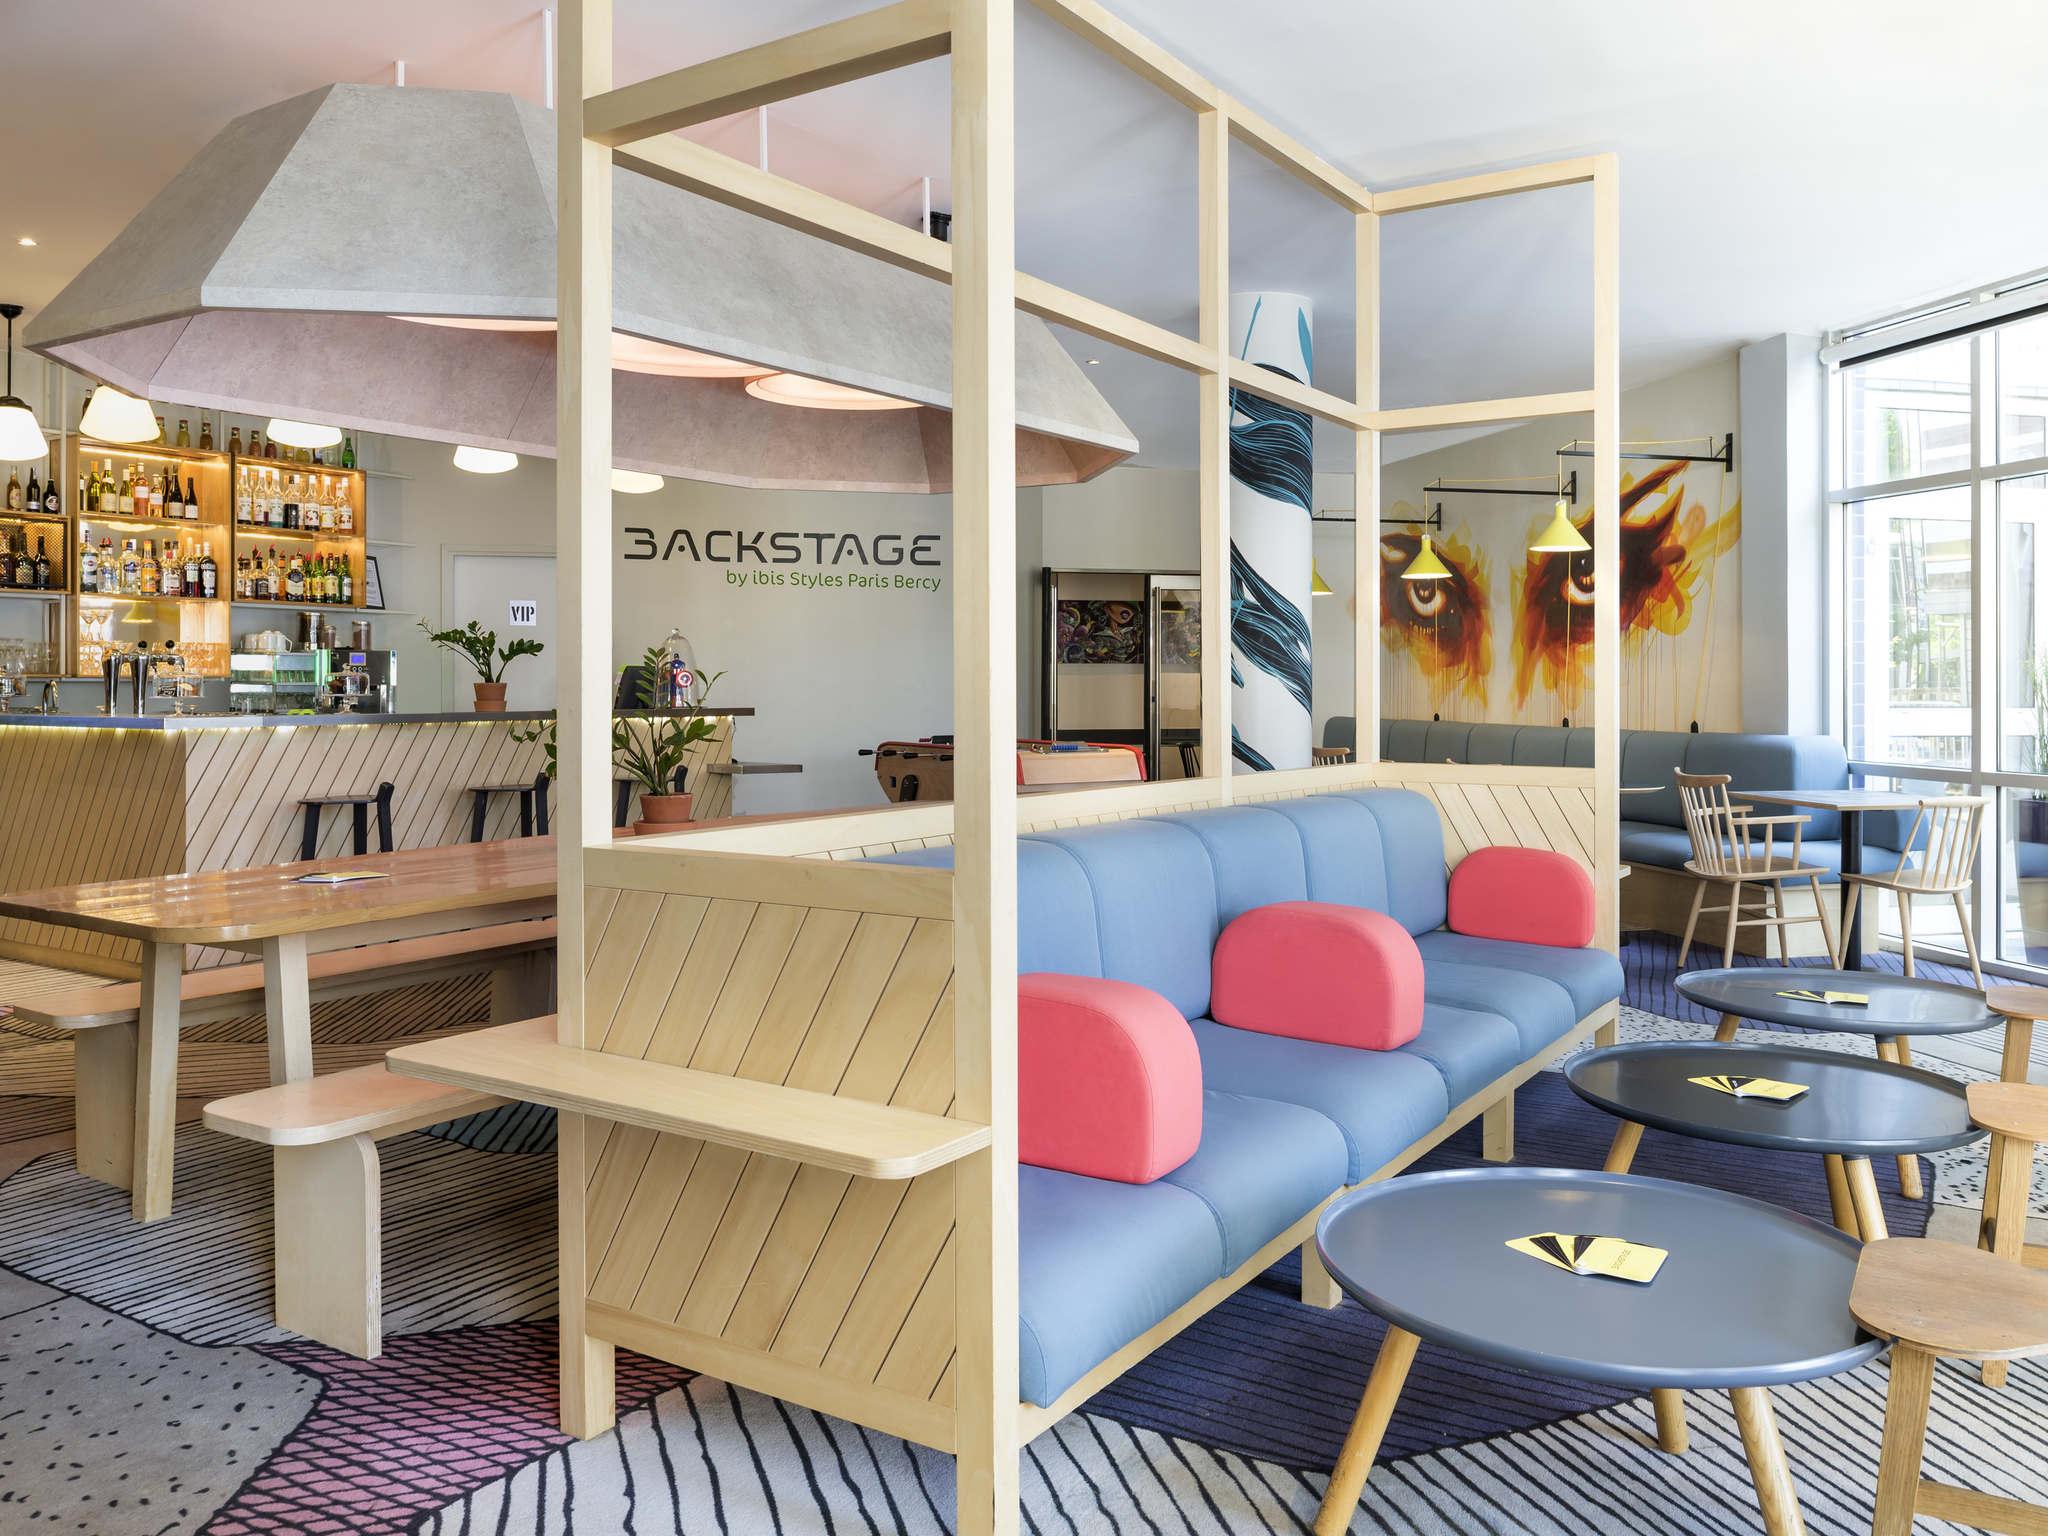 Hotel in paris ibis styles paris bercy - Hotel chambre familiale paris ...